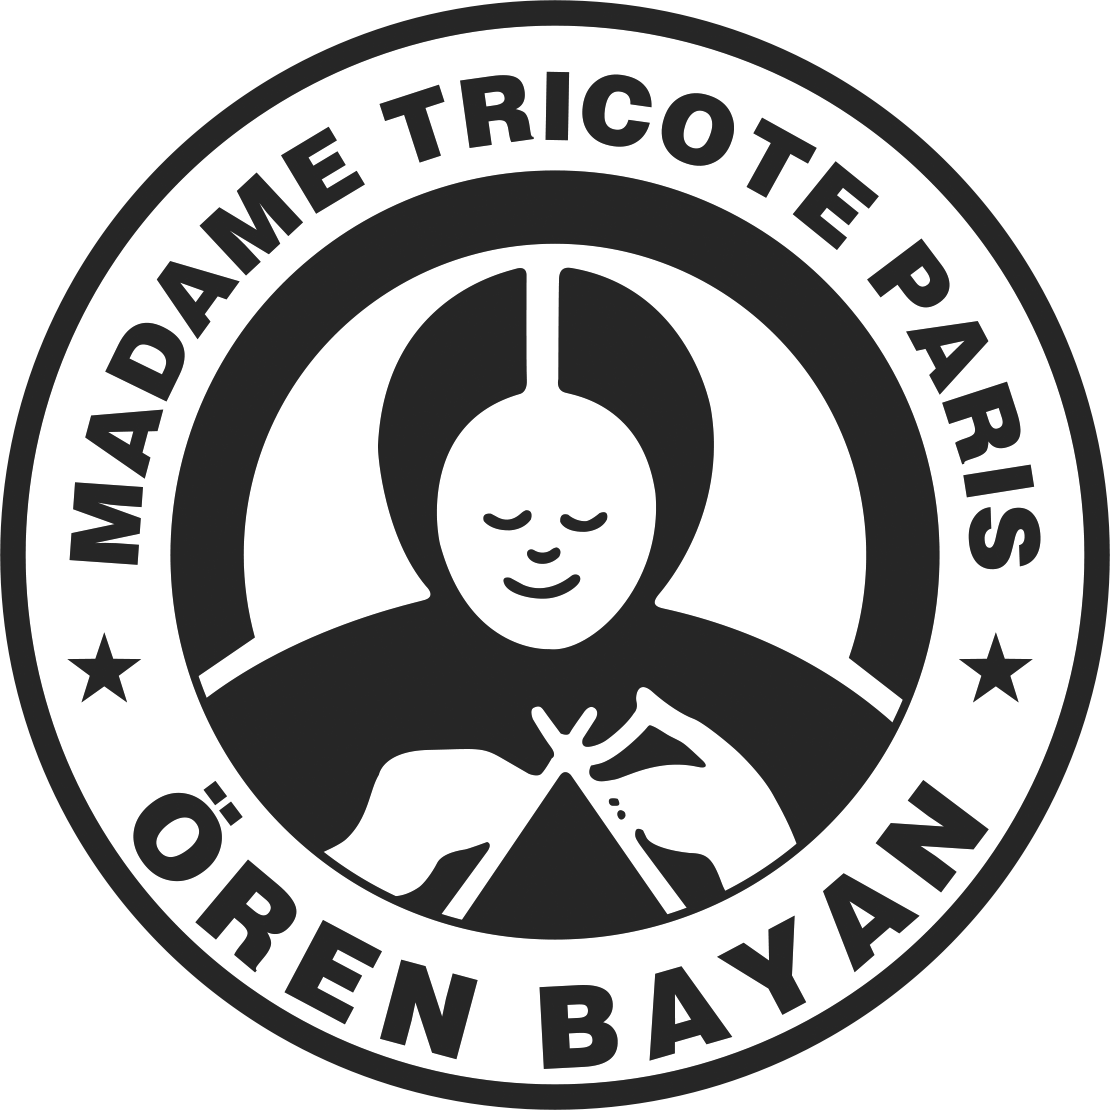 Ören Bayan / Madame Tricote Paris